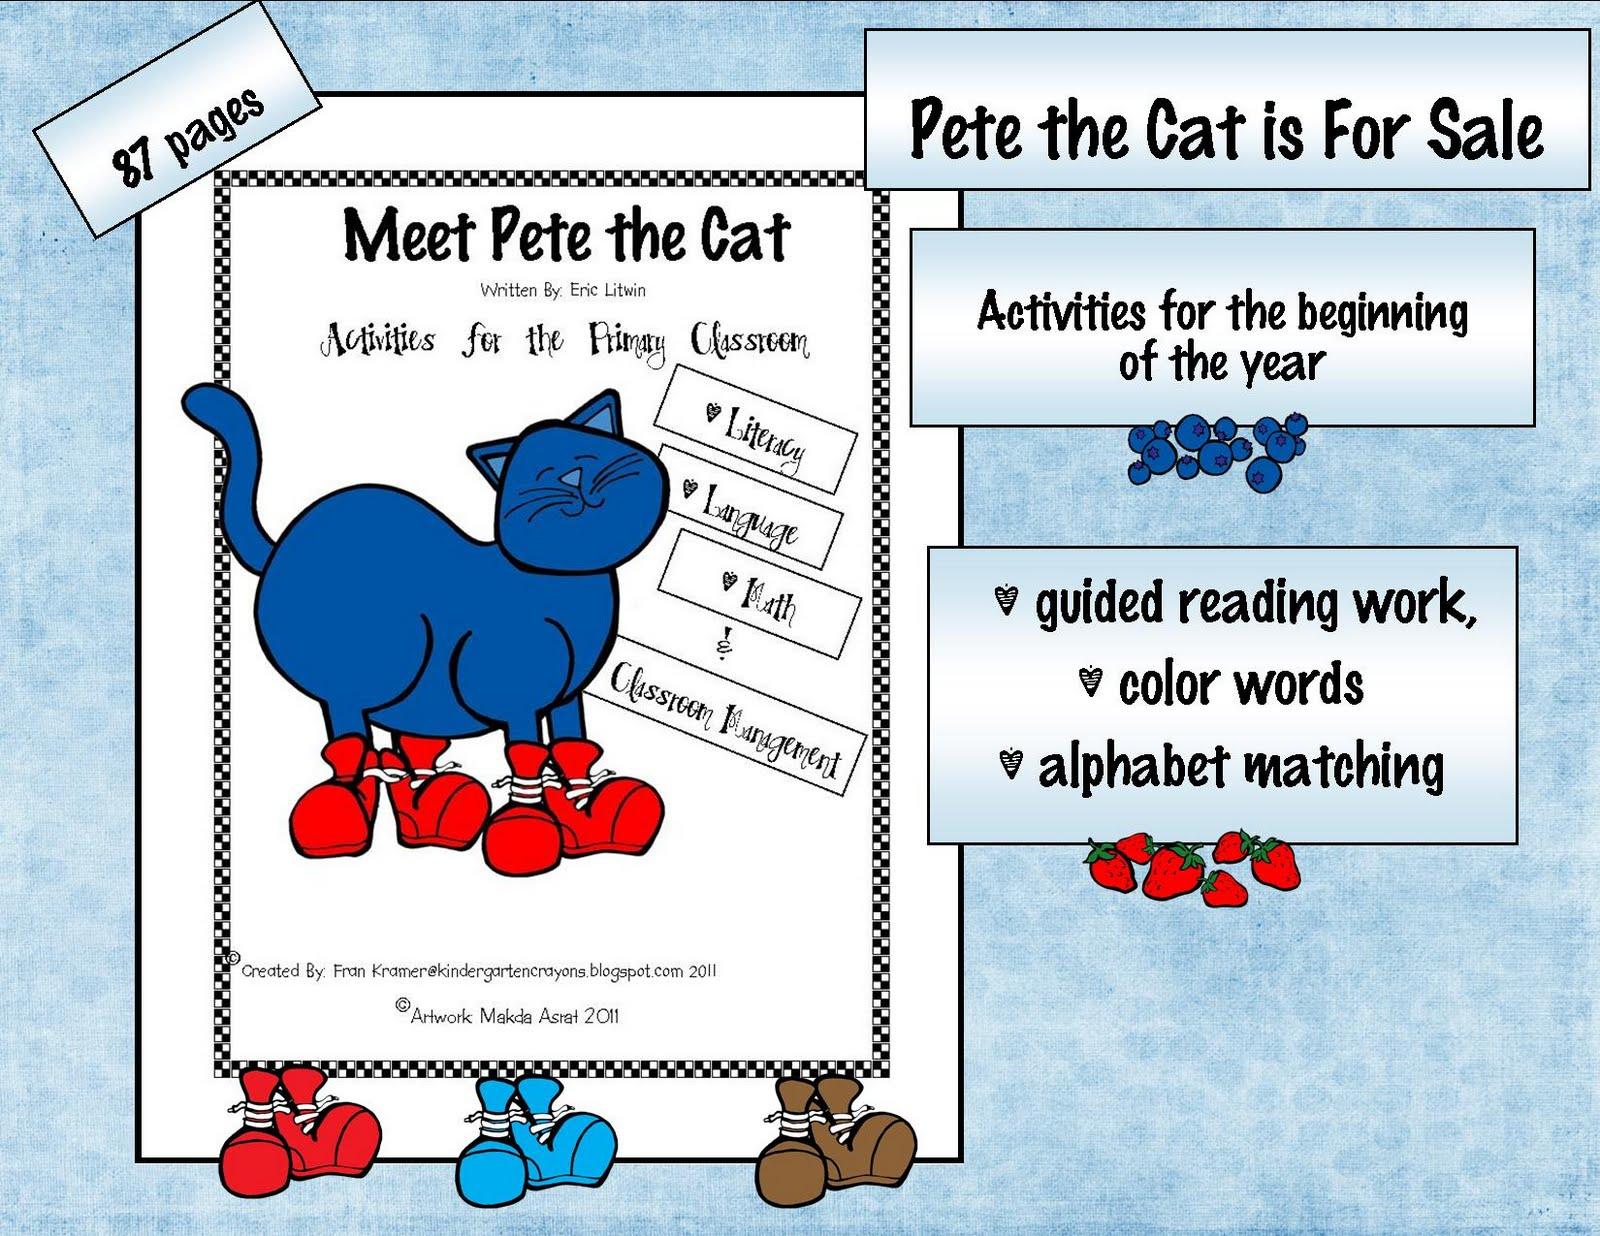 Kindergarten Crayons Who Wants To Buy A Cat